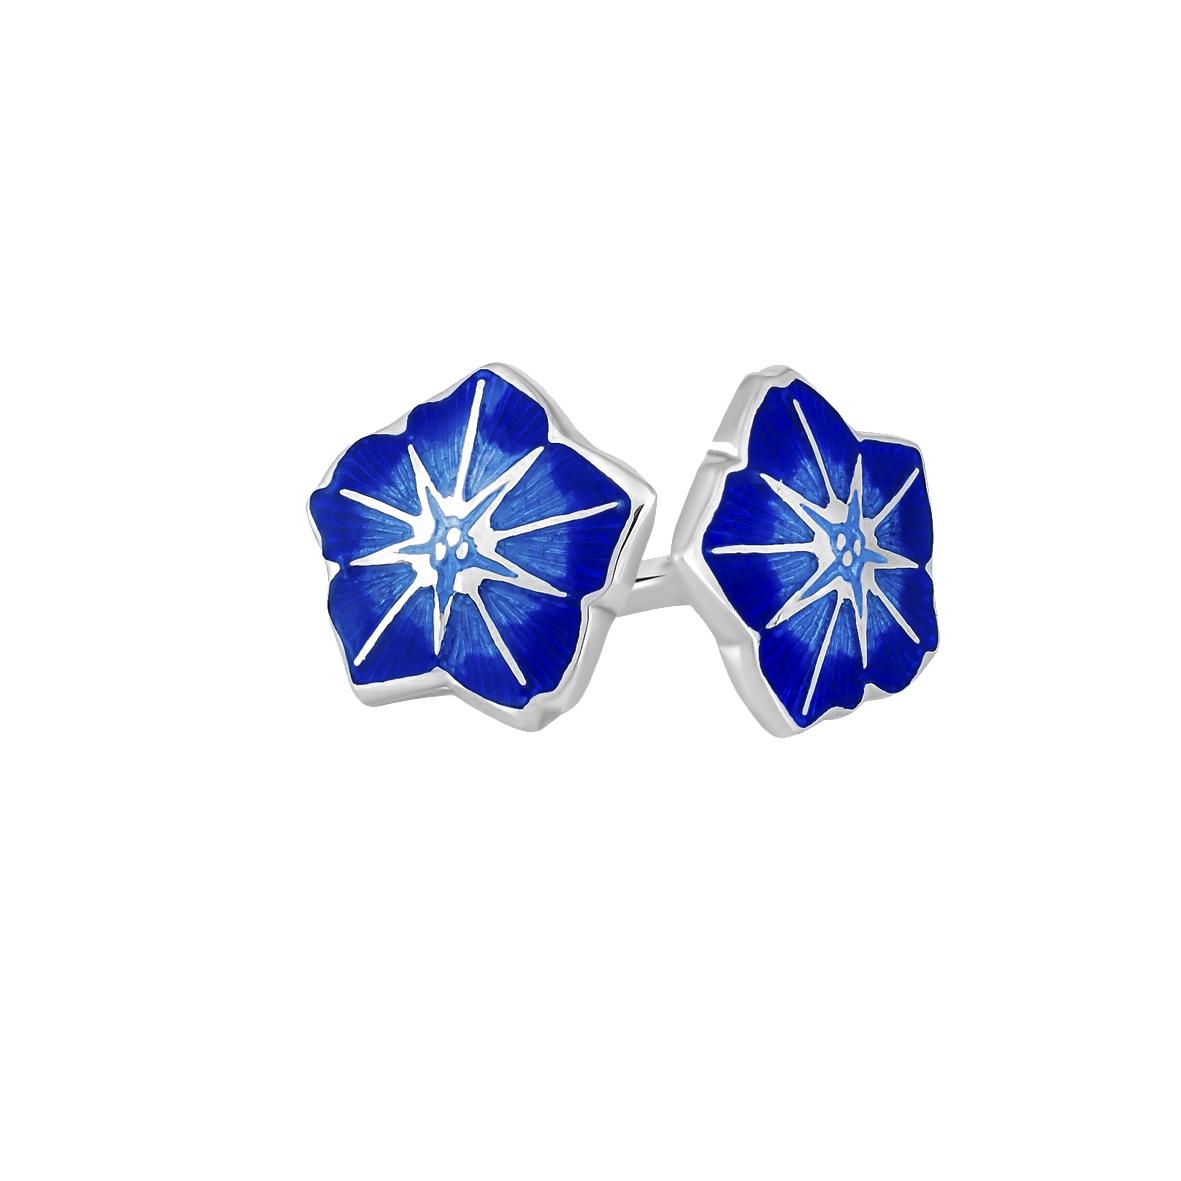 3 04p 3s 2 - Пуссеты «Петуния», синяя